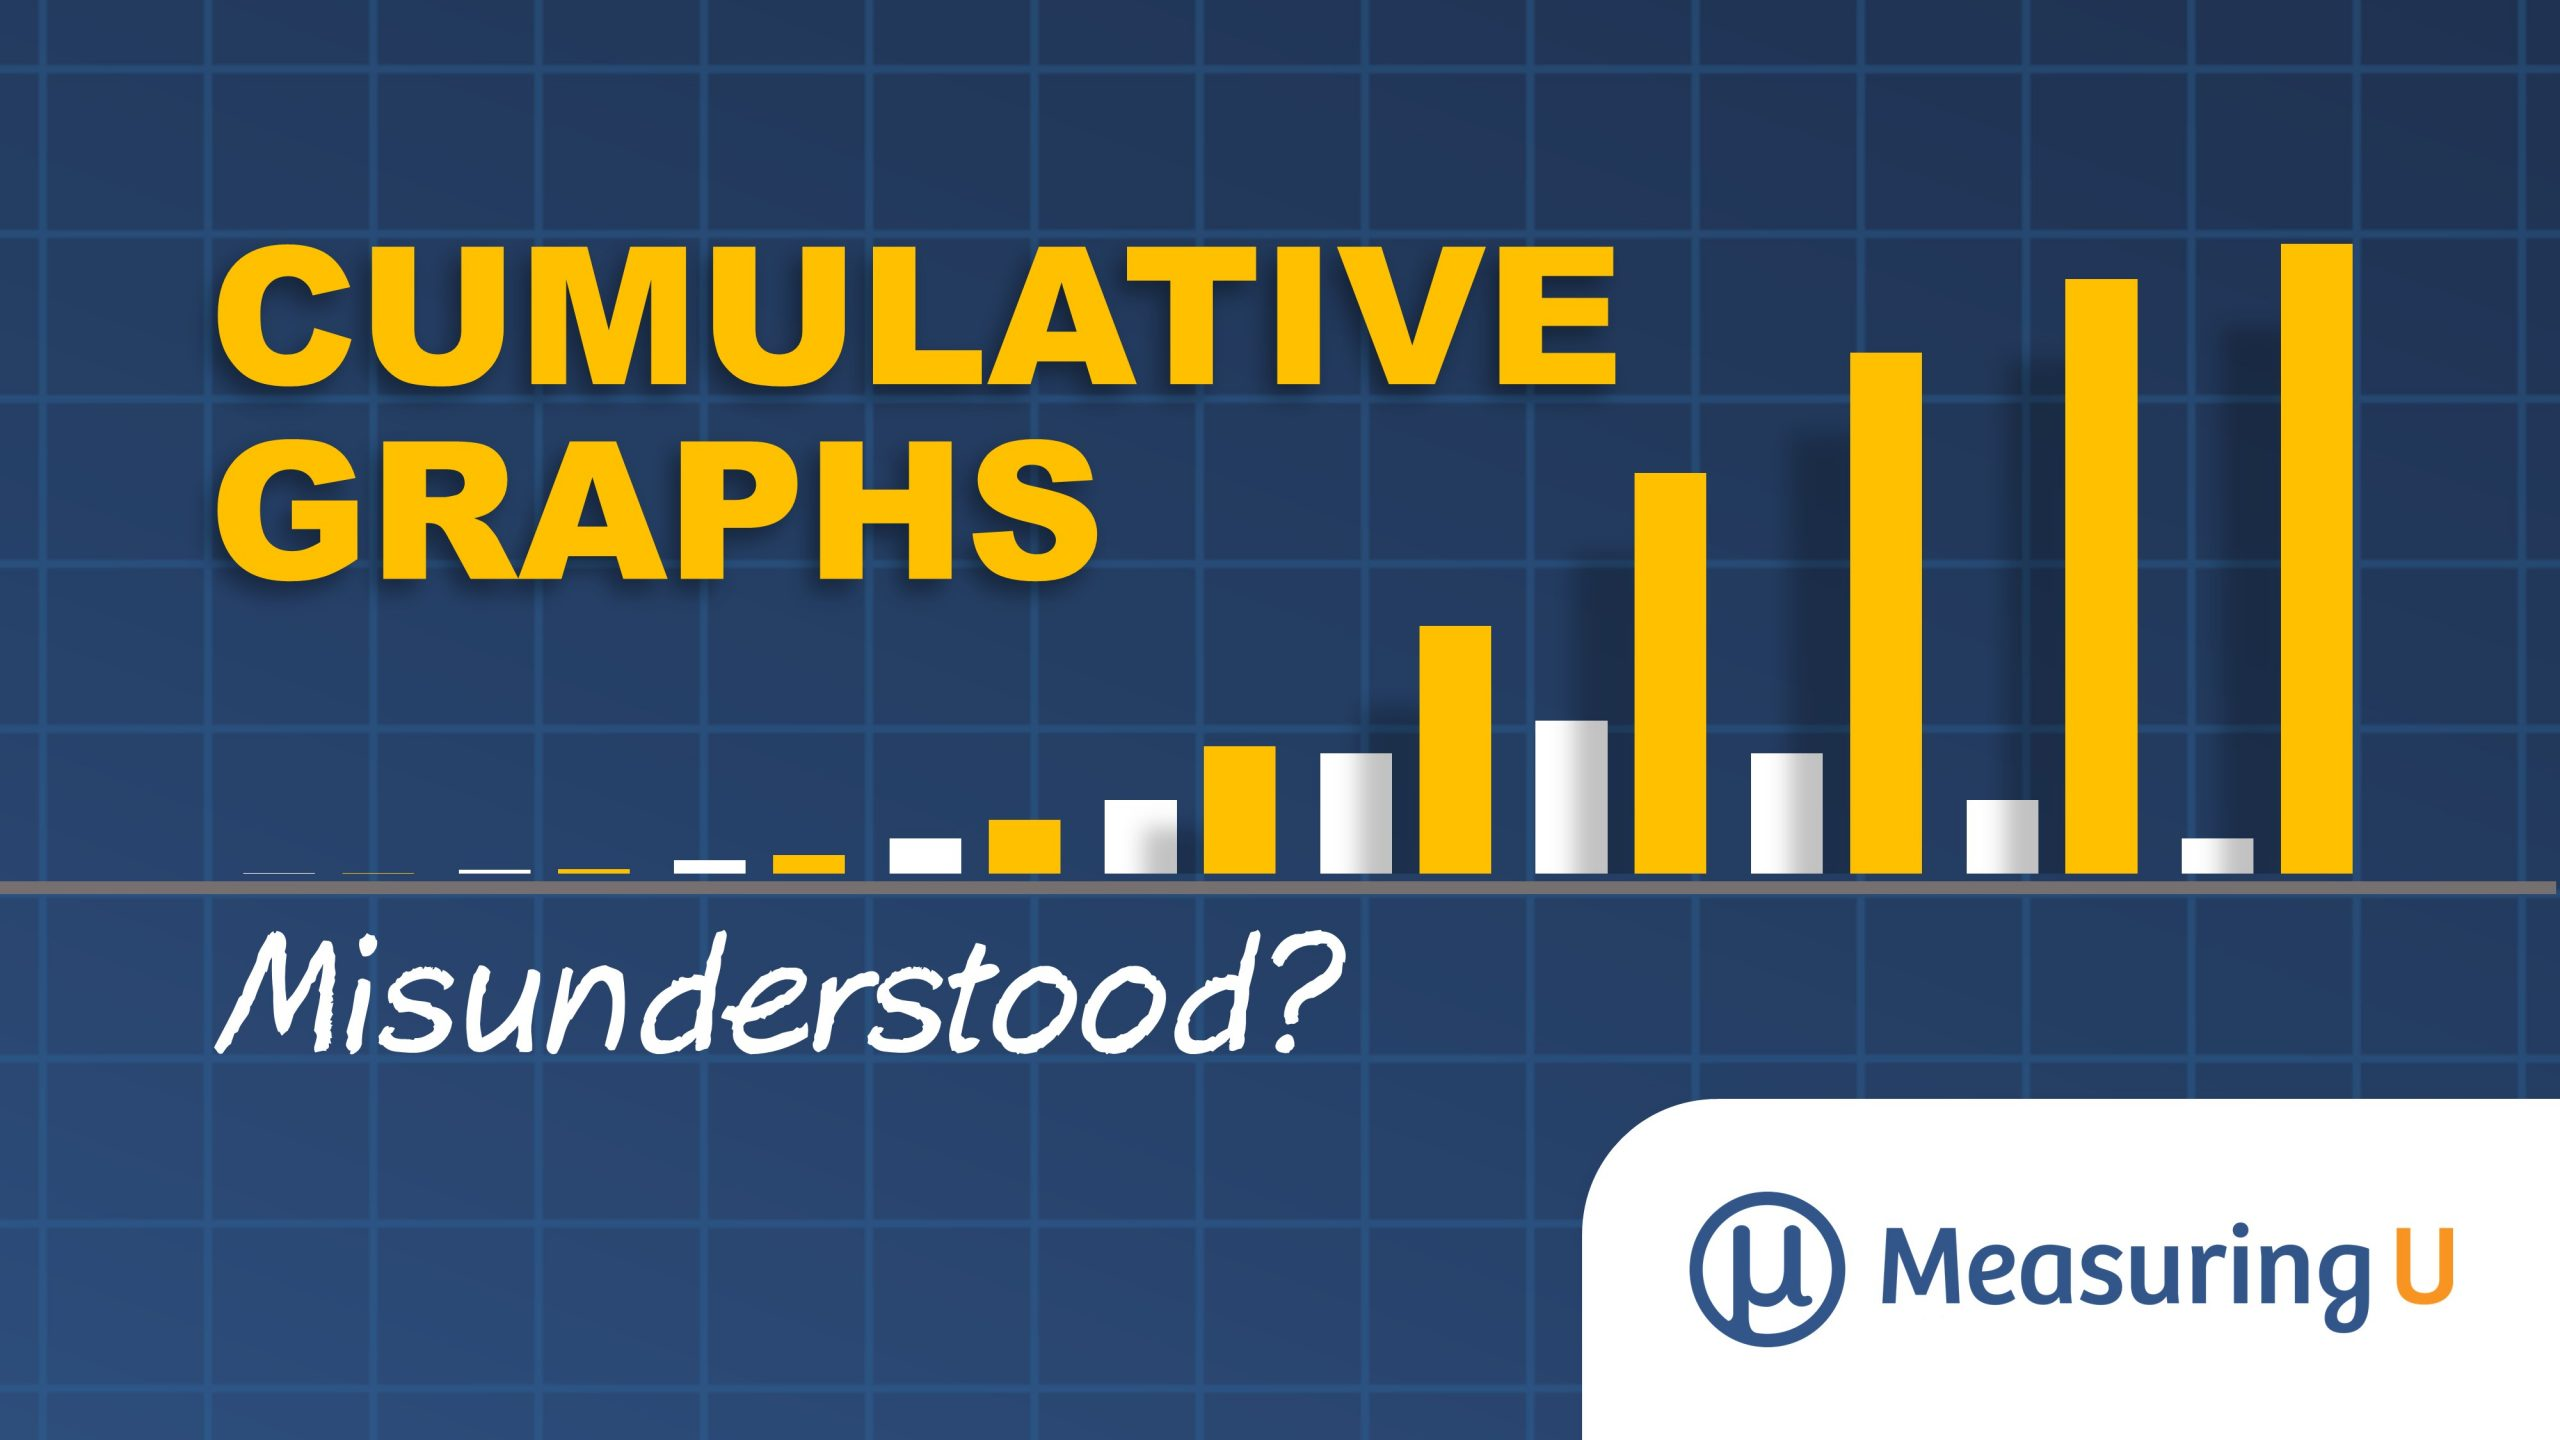 Are Cumulative Graphs Misunderstood?